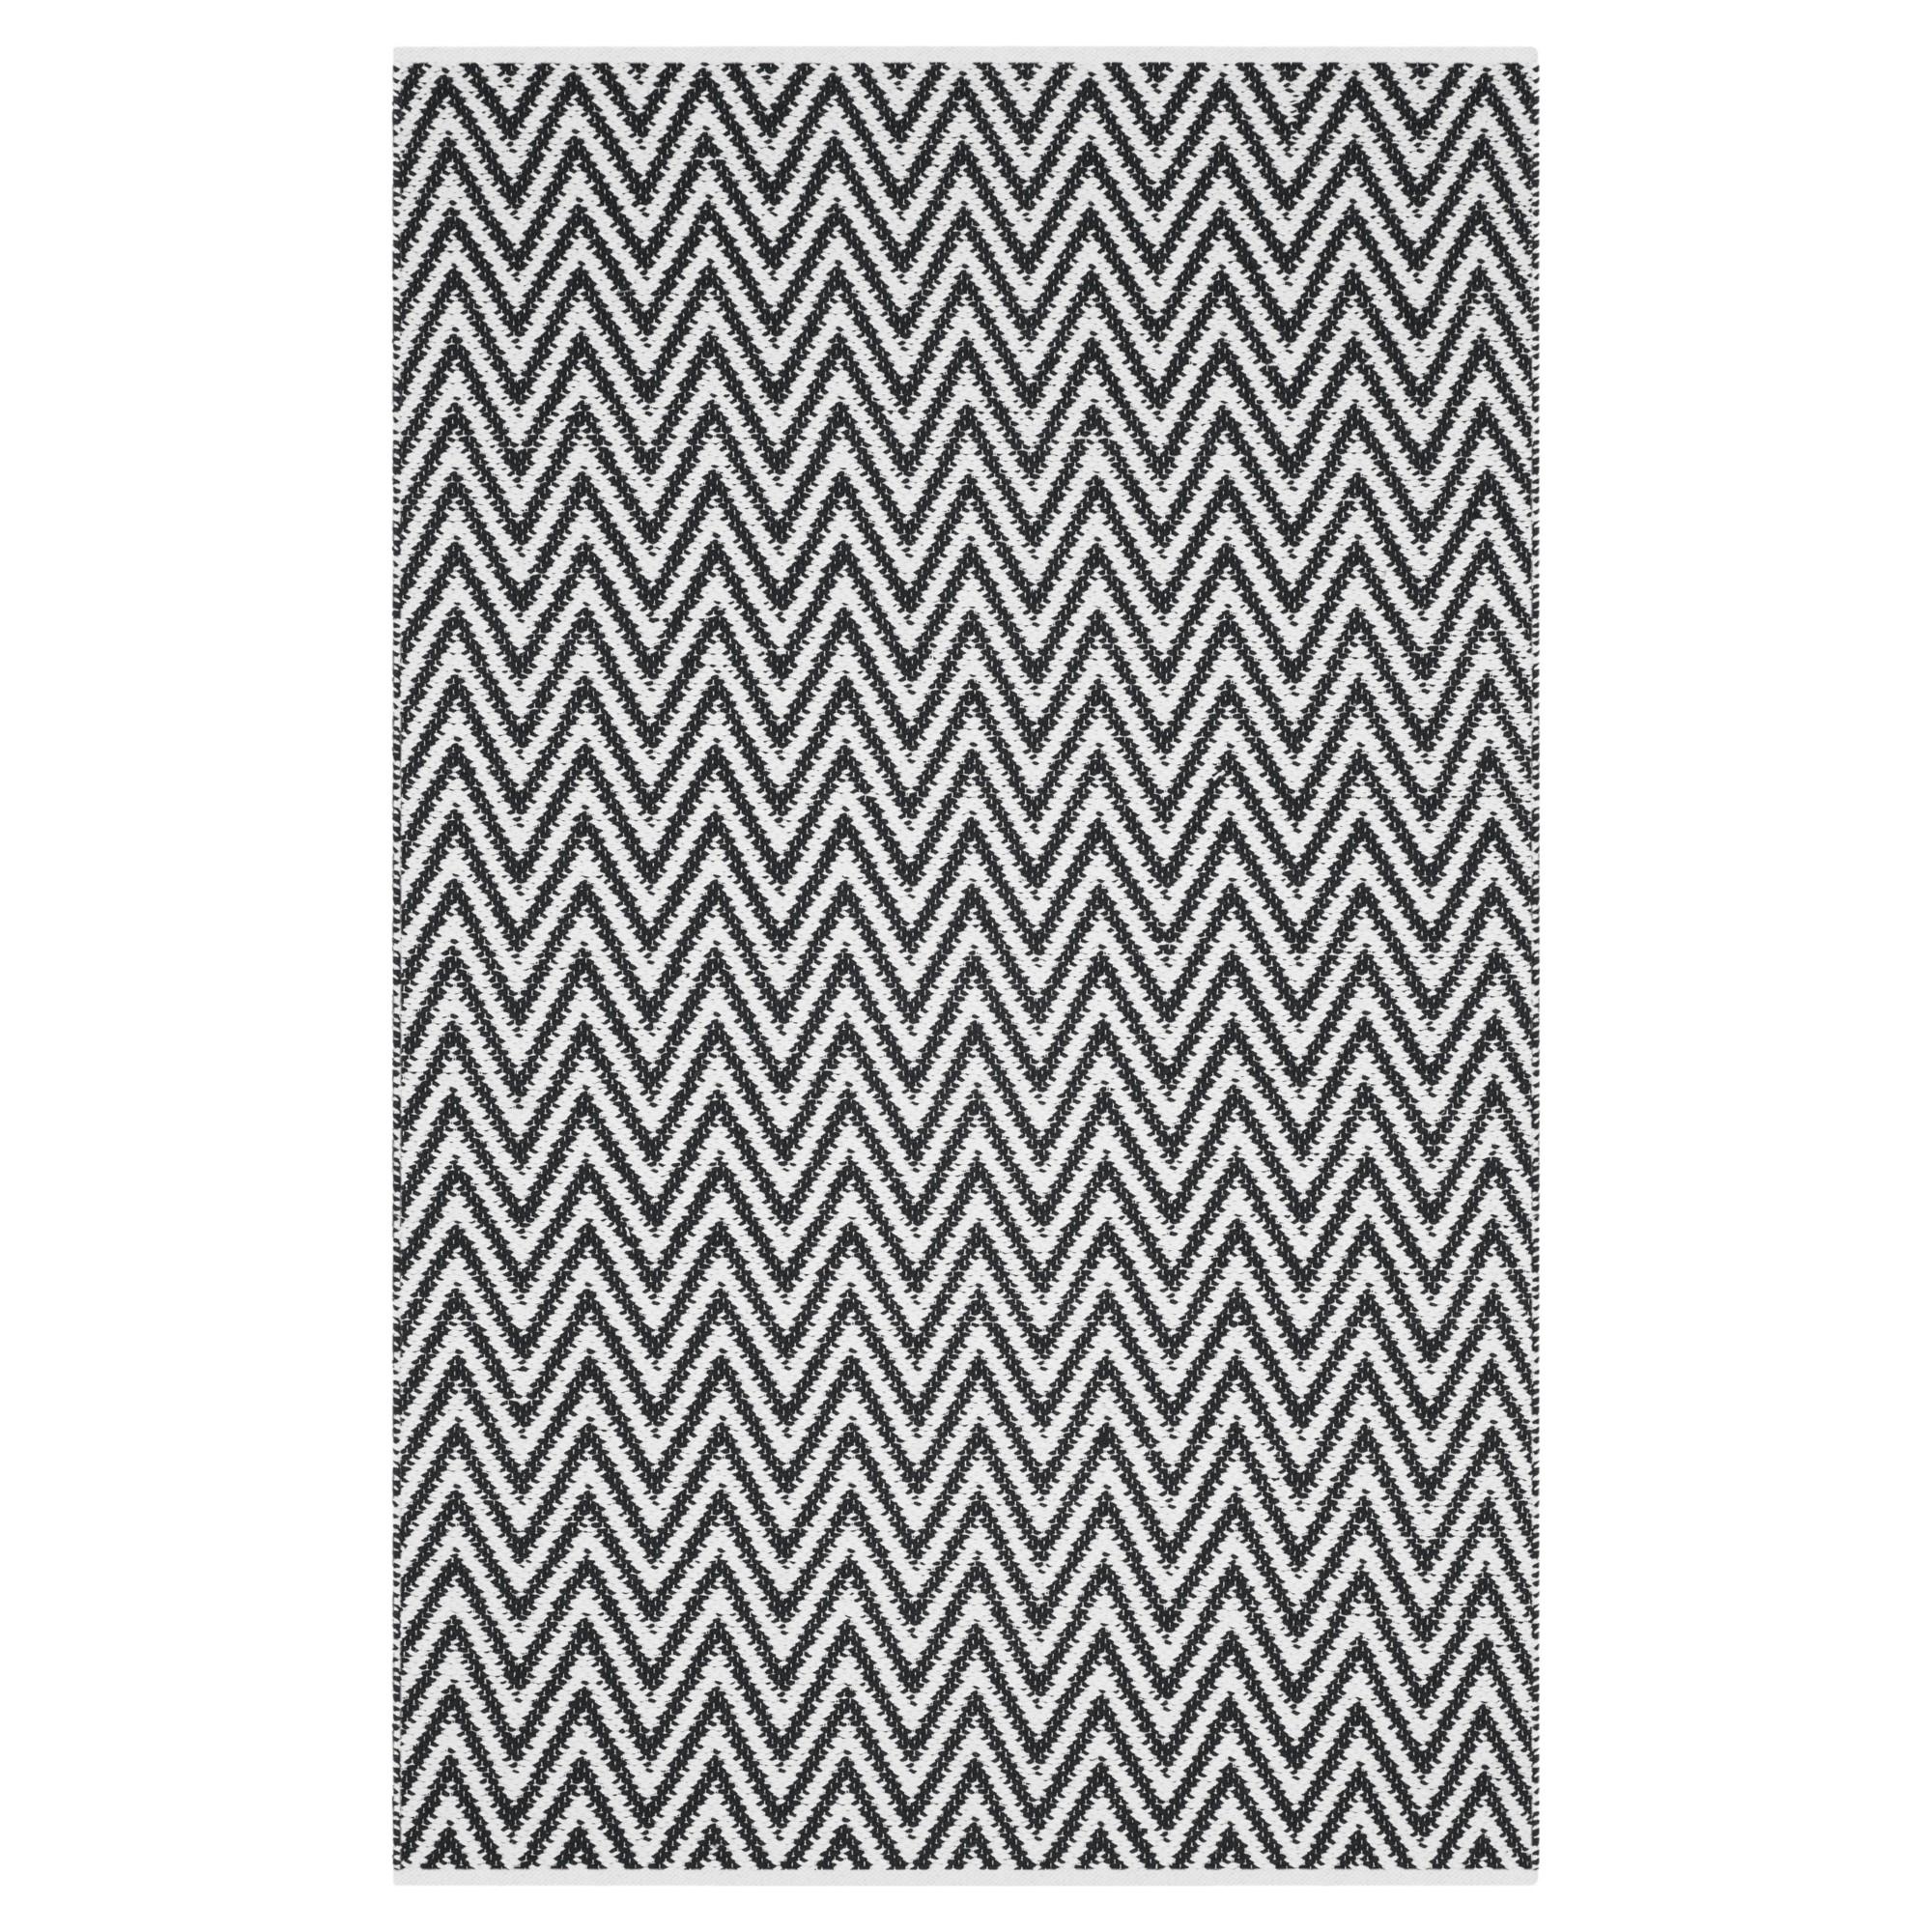 Montauk Rug - Black/Ivory - (4'x6') - Safavieh